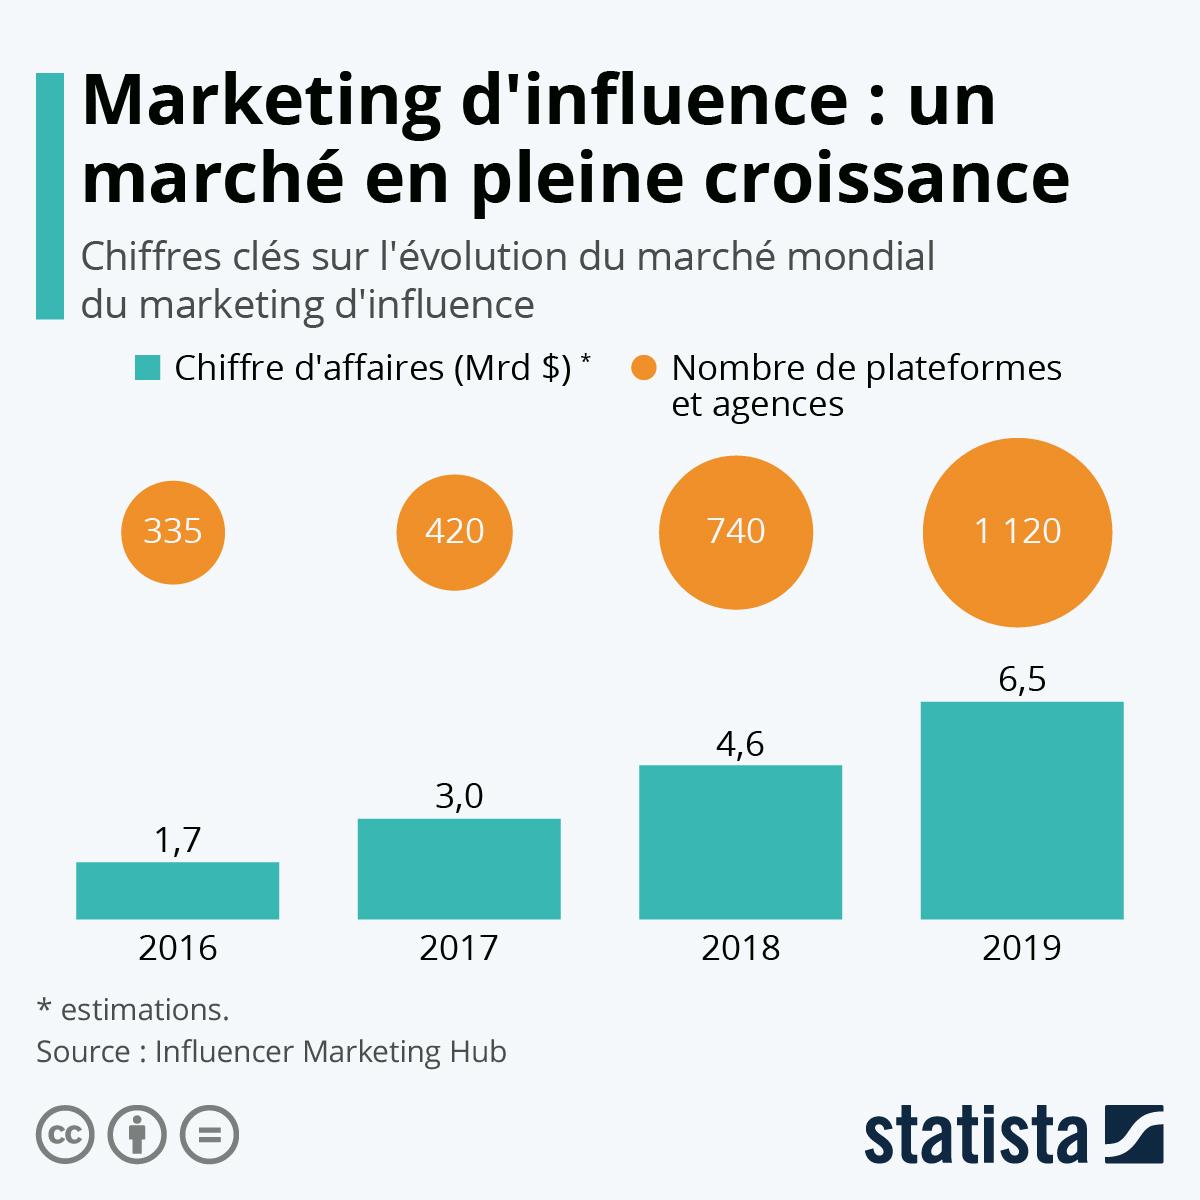 Infographie: Marketing d'influence : un marché en pleine croissance | Statista